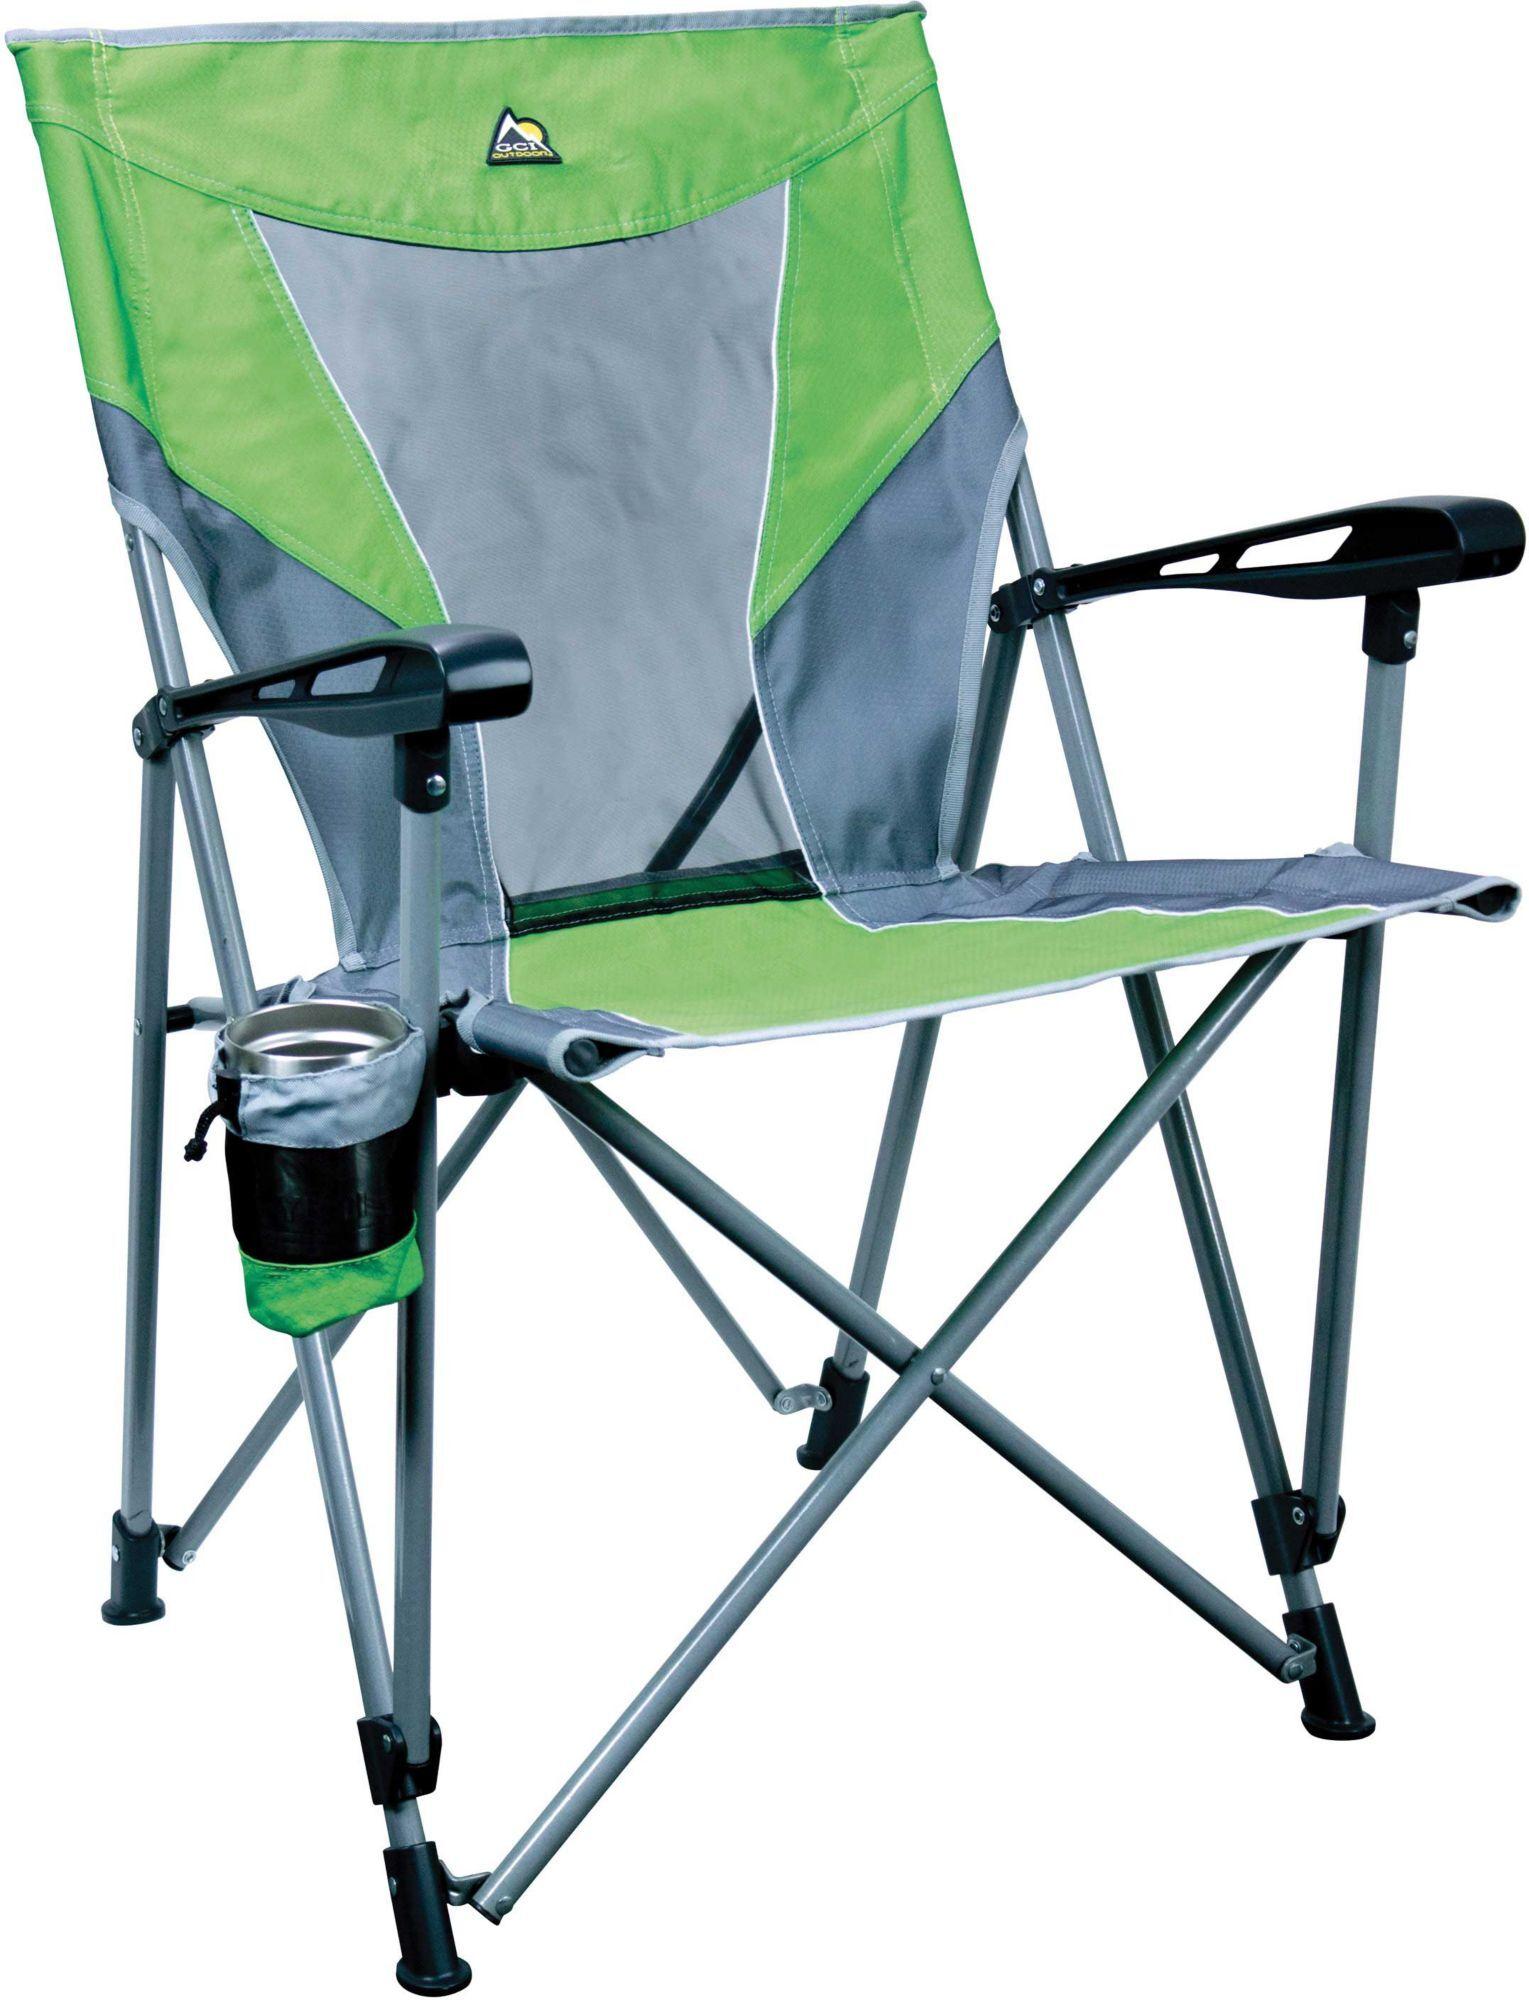 GCI Outdoor Sports Chair, Green